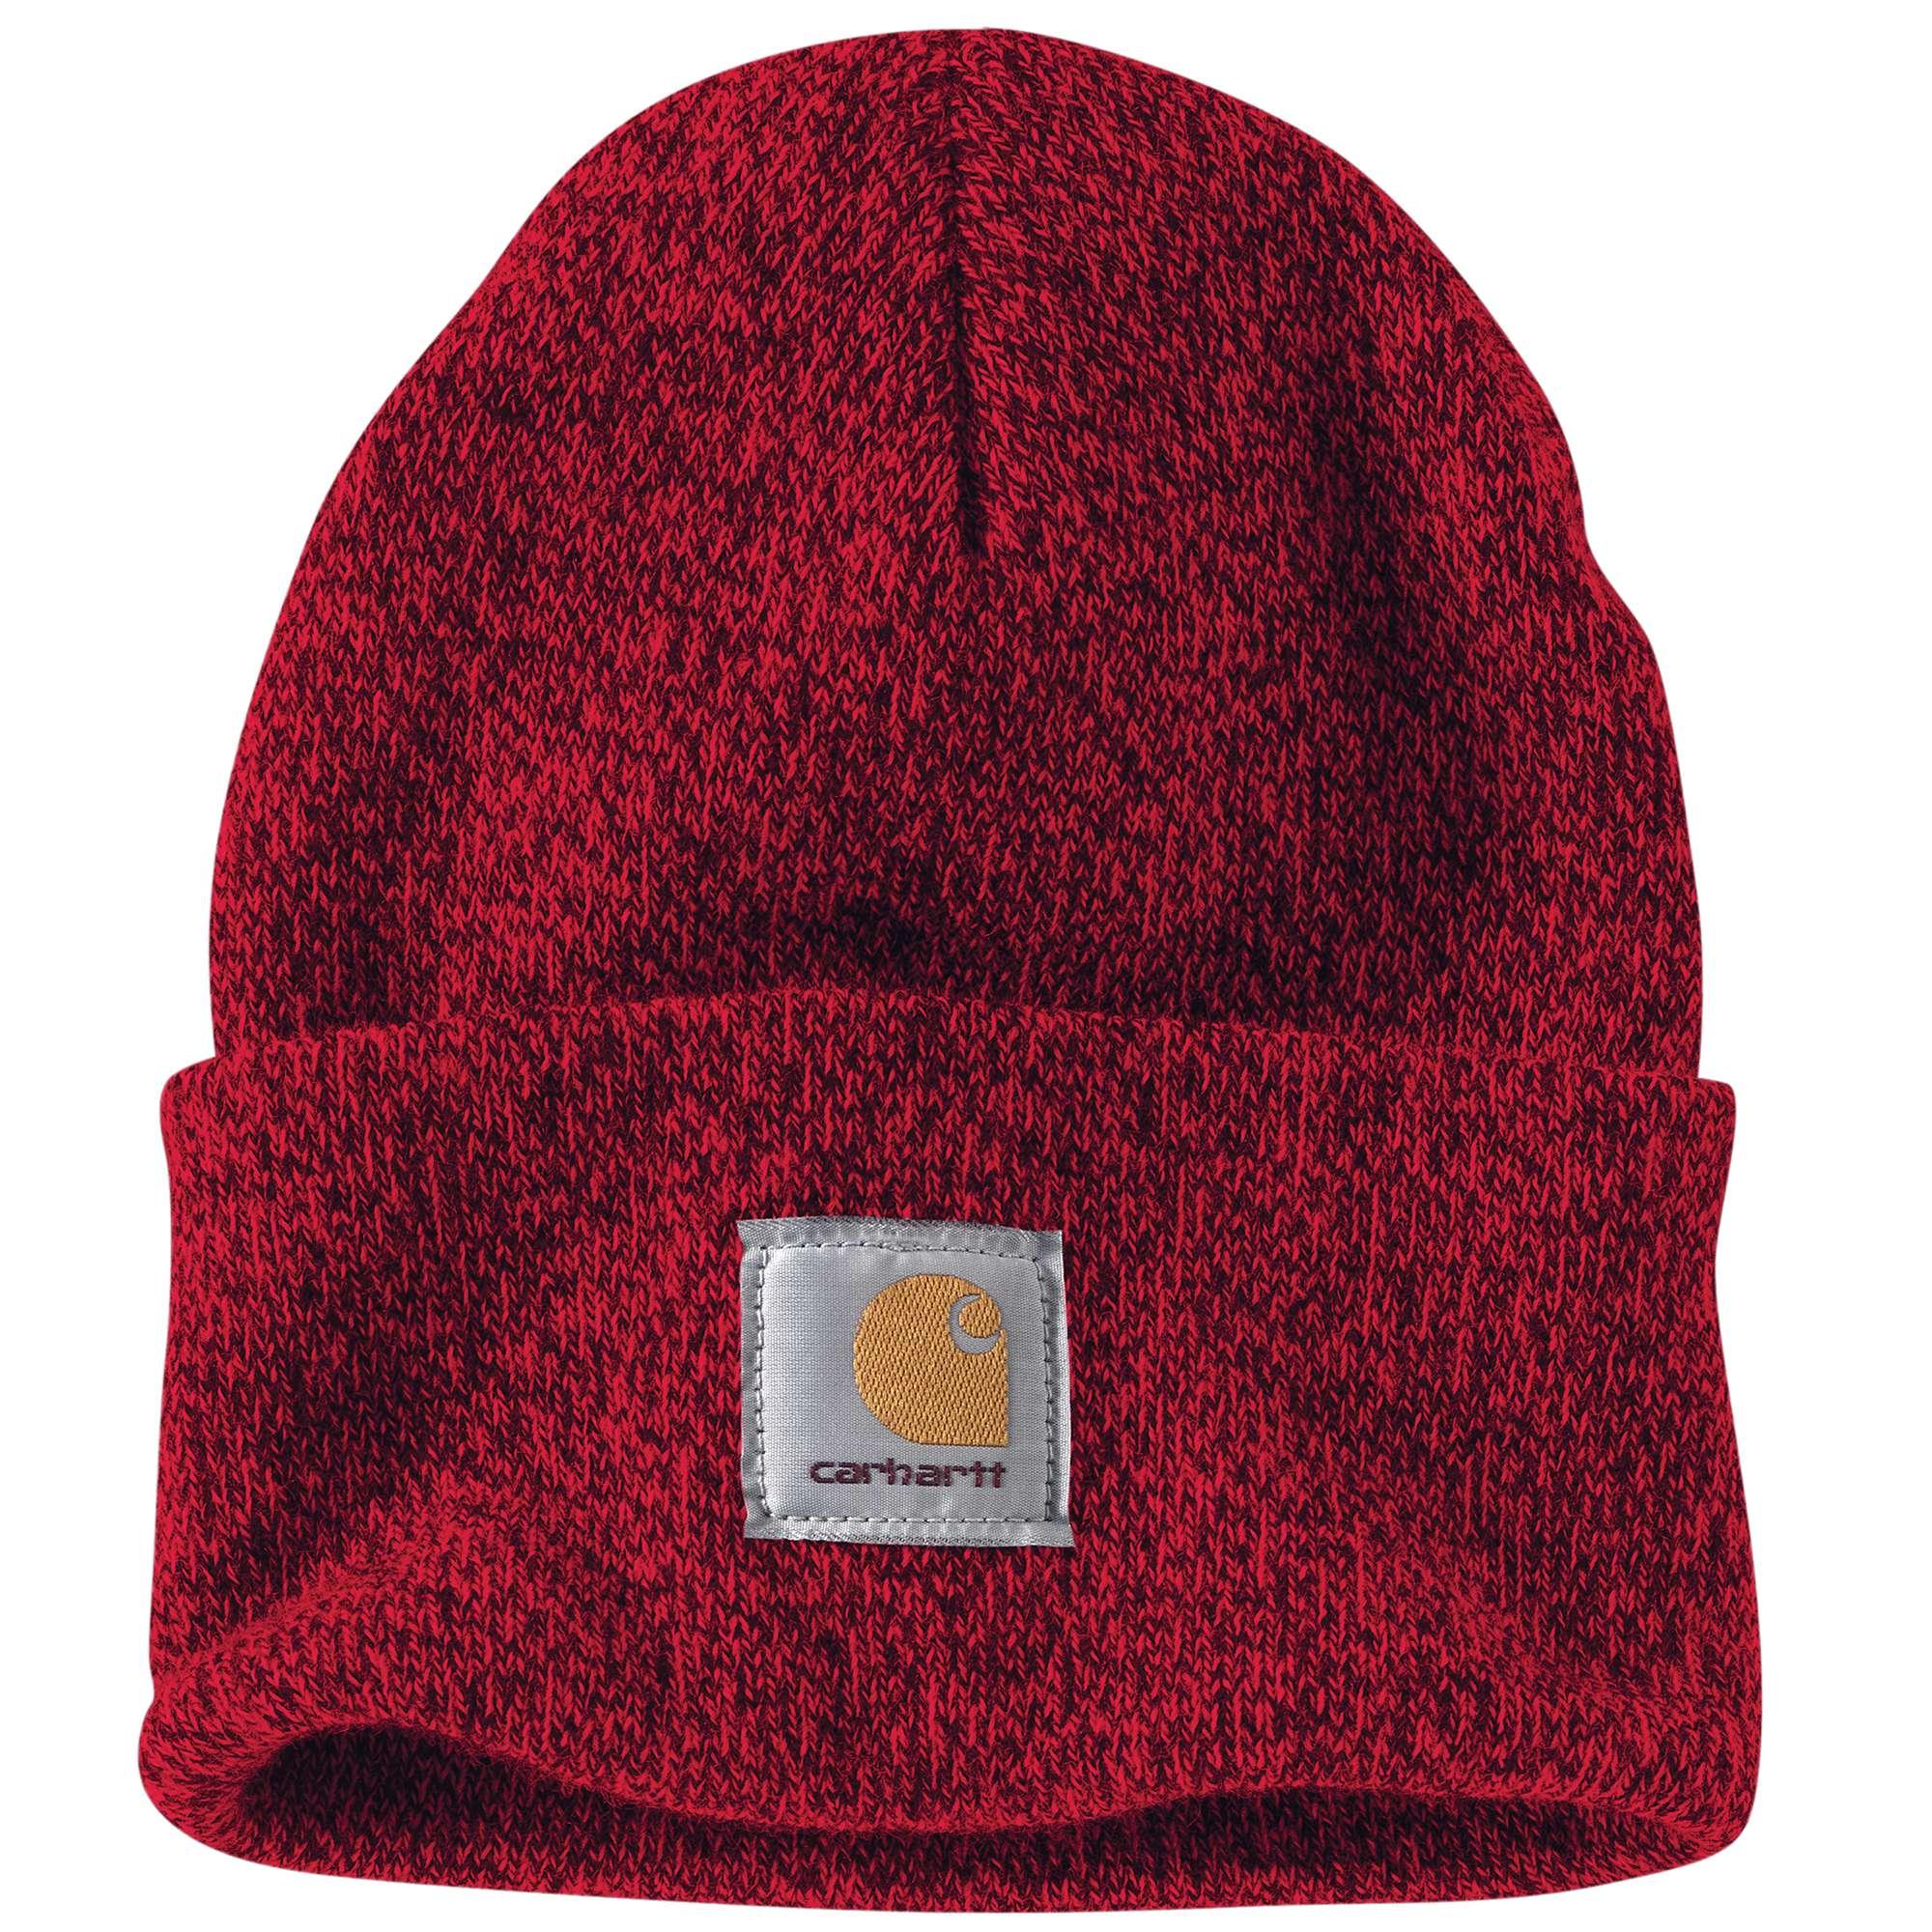 M Cotton Canvas Cap, Navy/Red, swatch